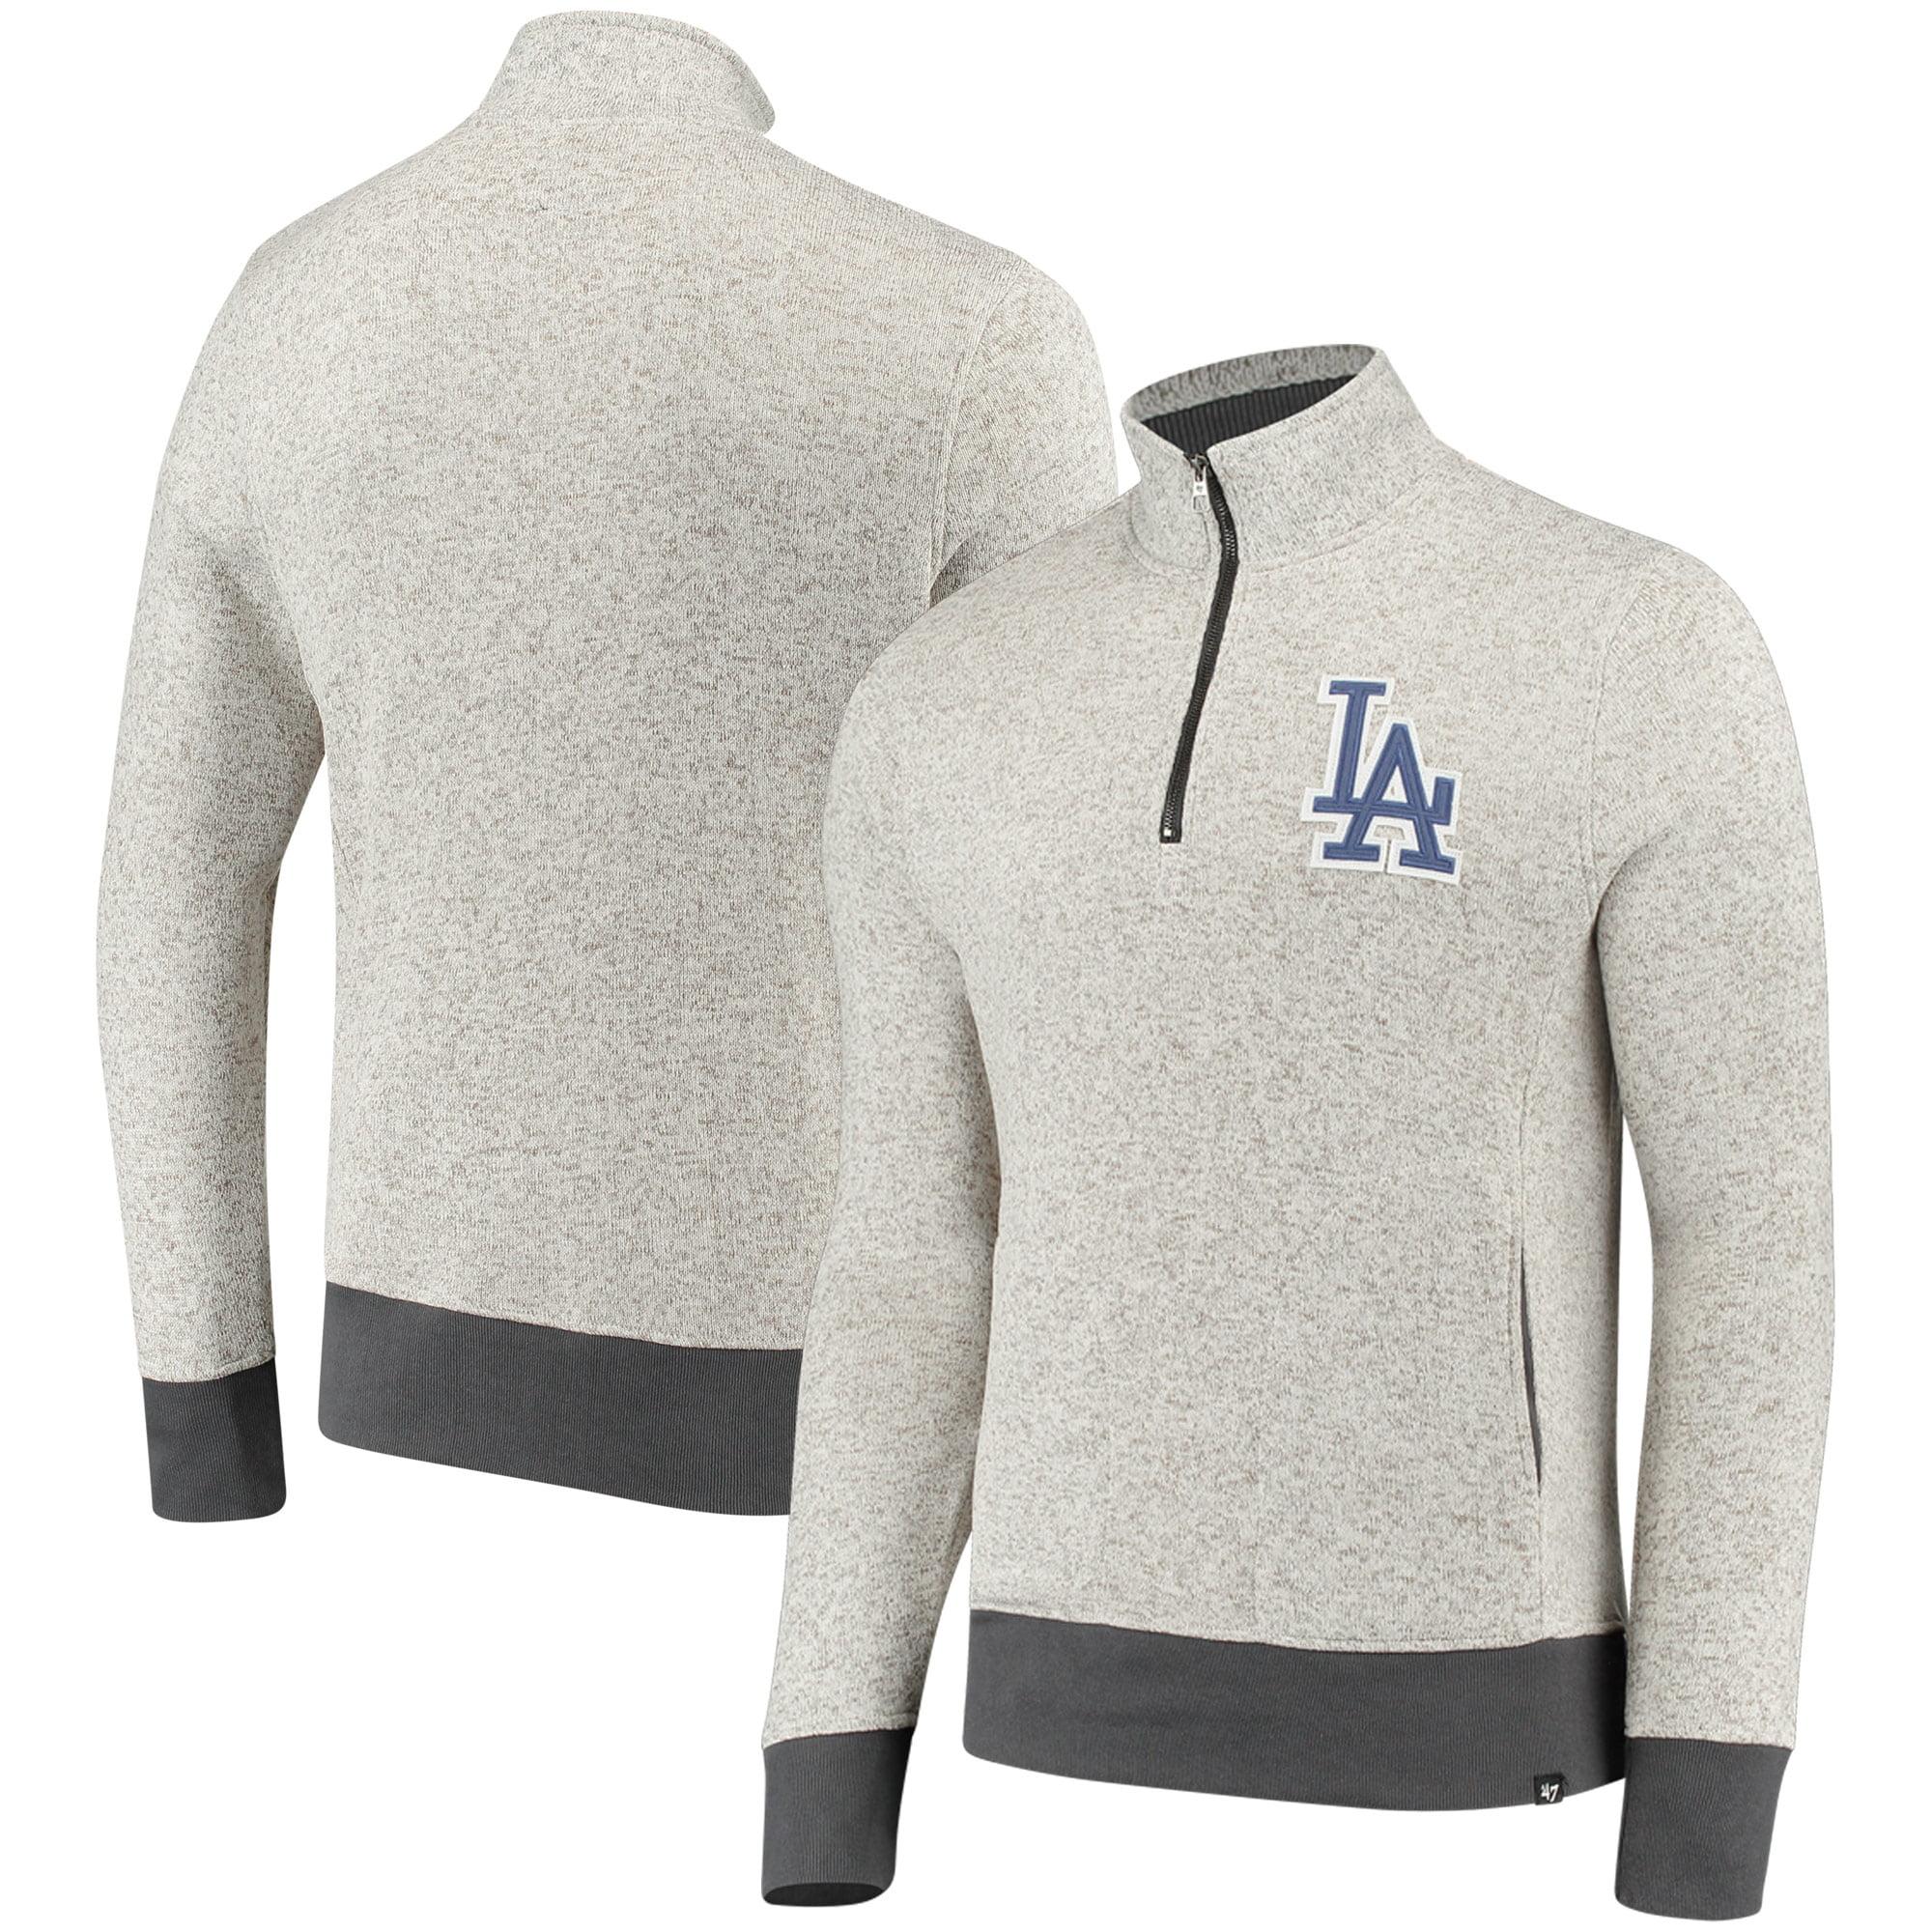 Los Angeles Dodgers '47 Kodiak Quarter-Zip Pullover Jacket - Cream